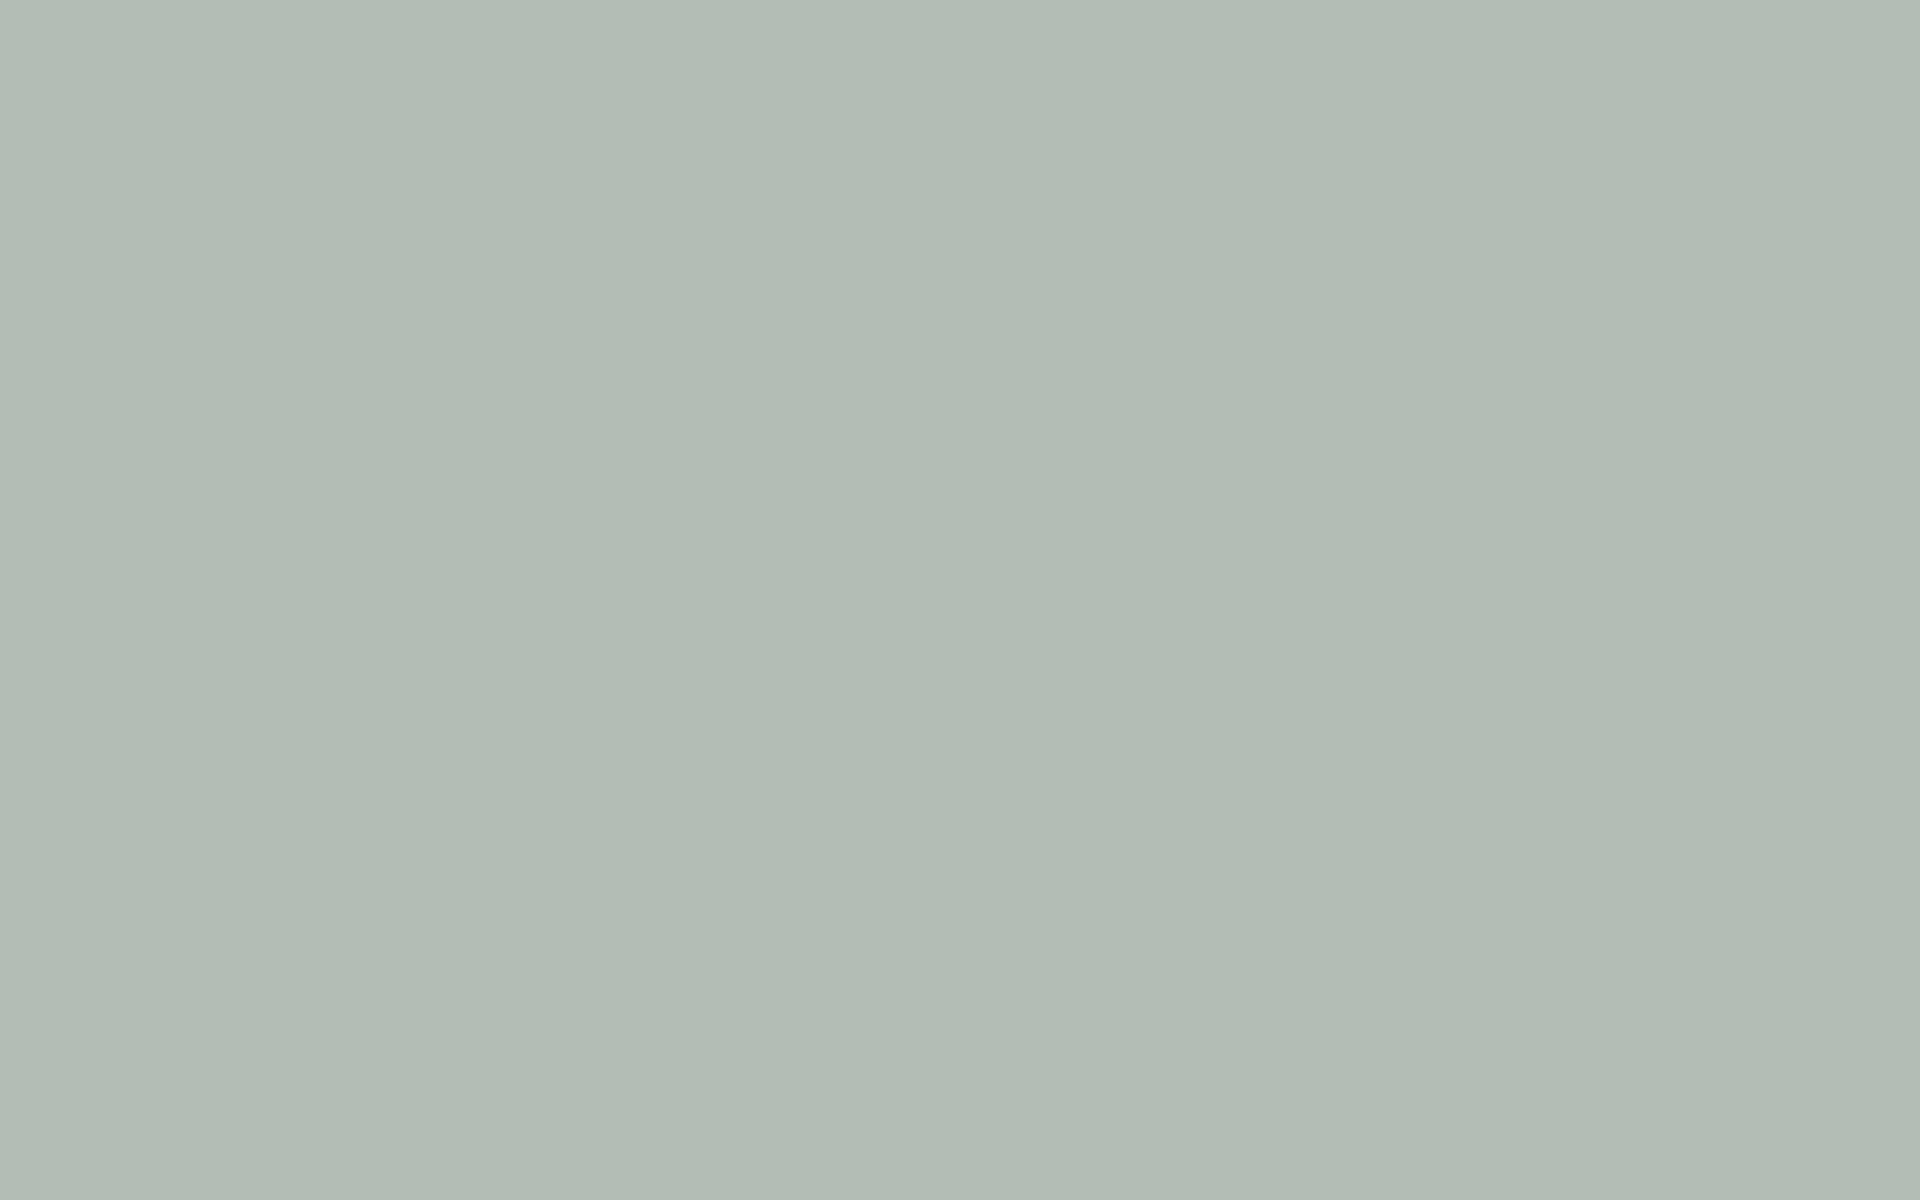 1920x1200 Ash Grey Solid Color Background